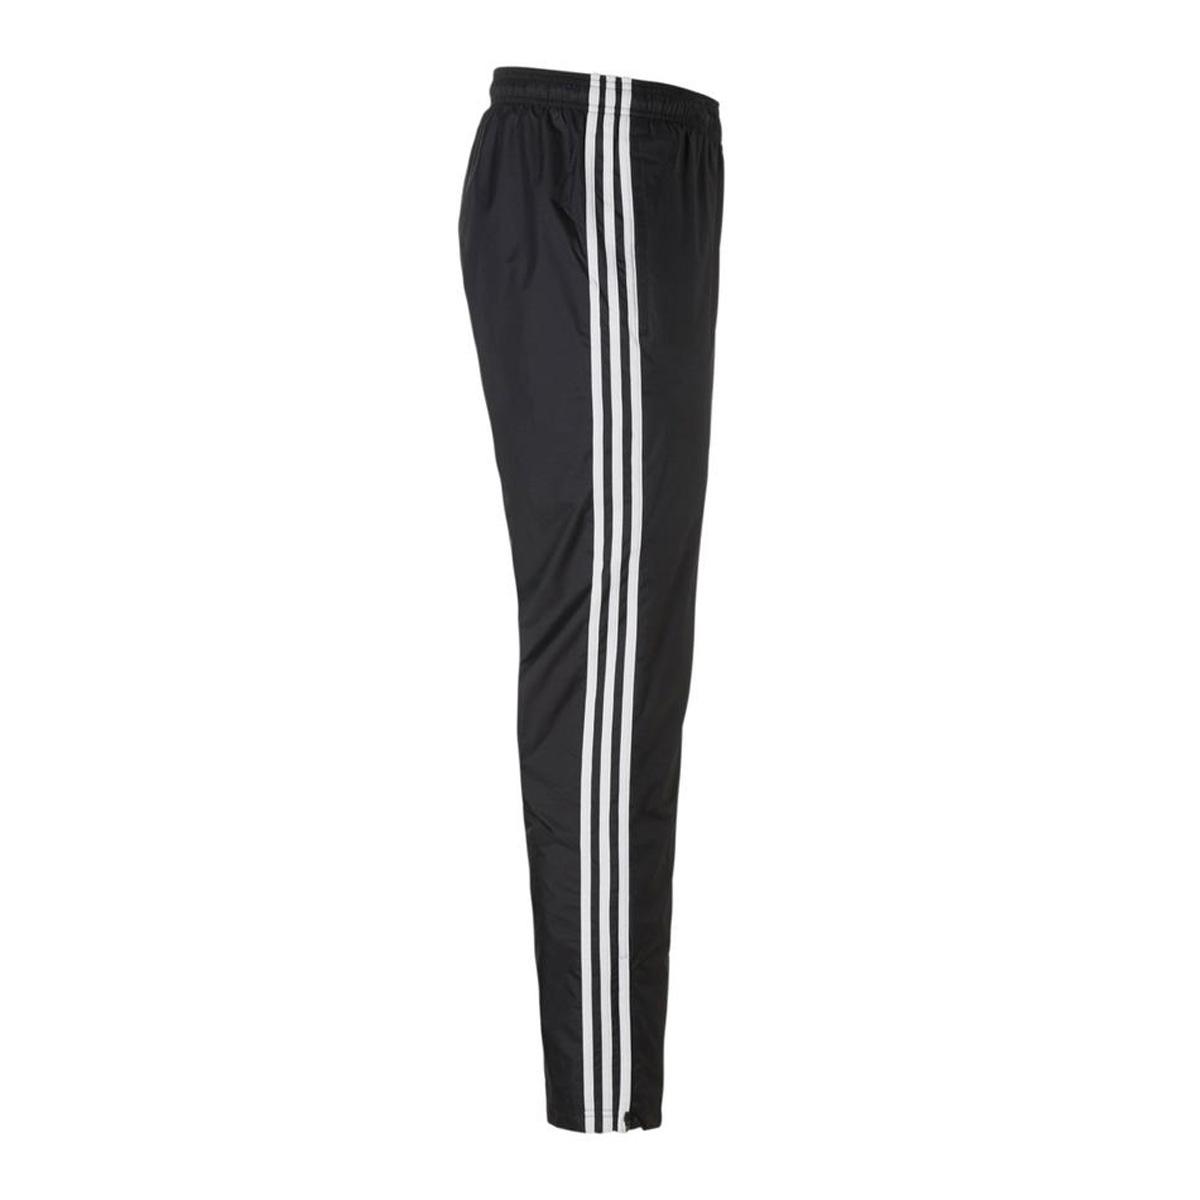 Adidas Essentials 3 stripes Woven trainingsbroek